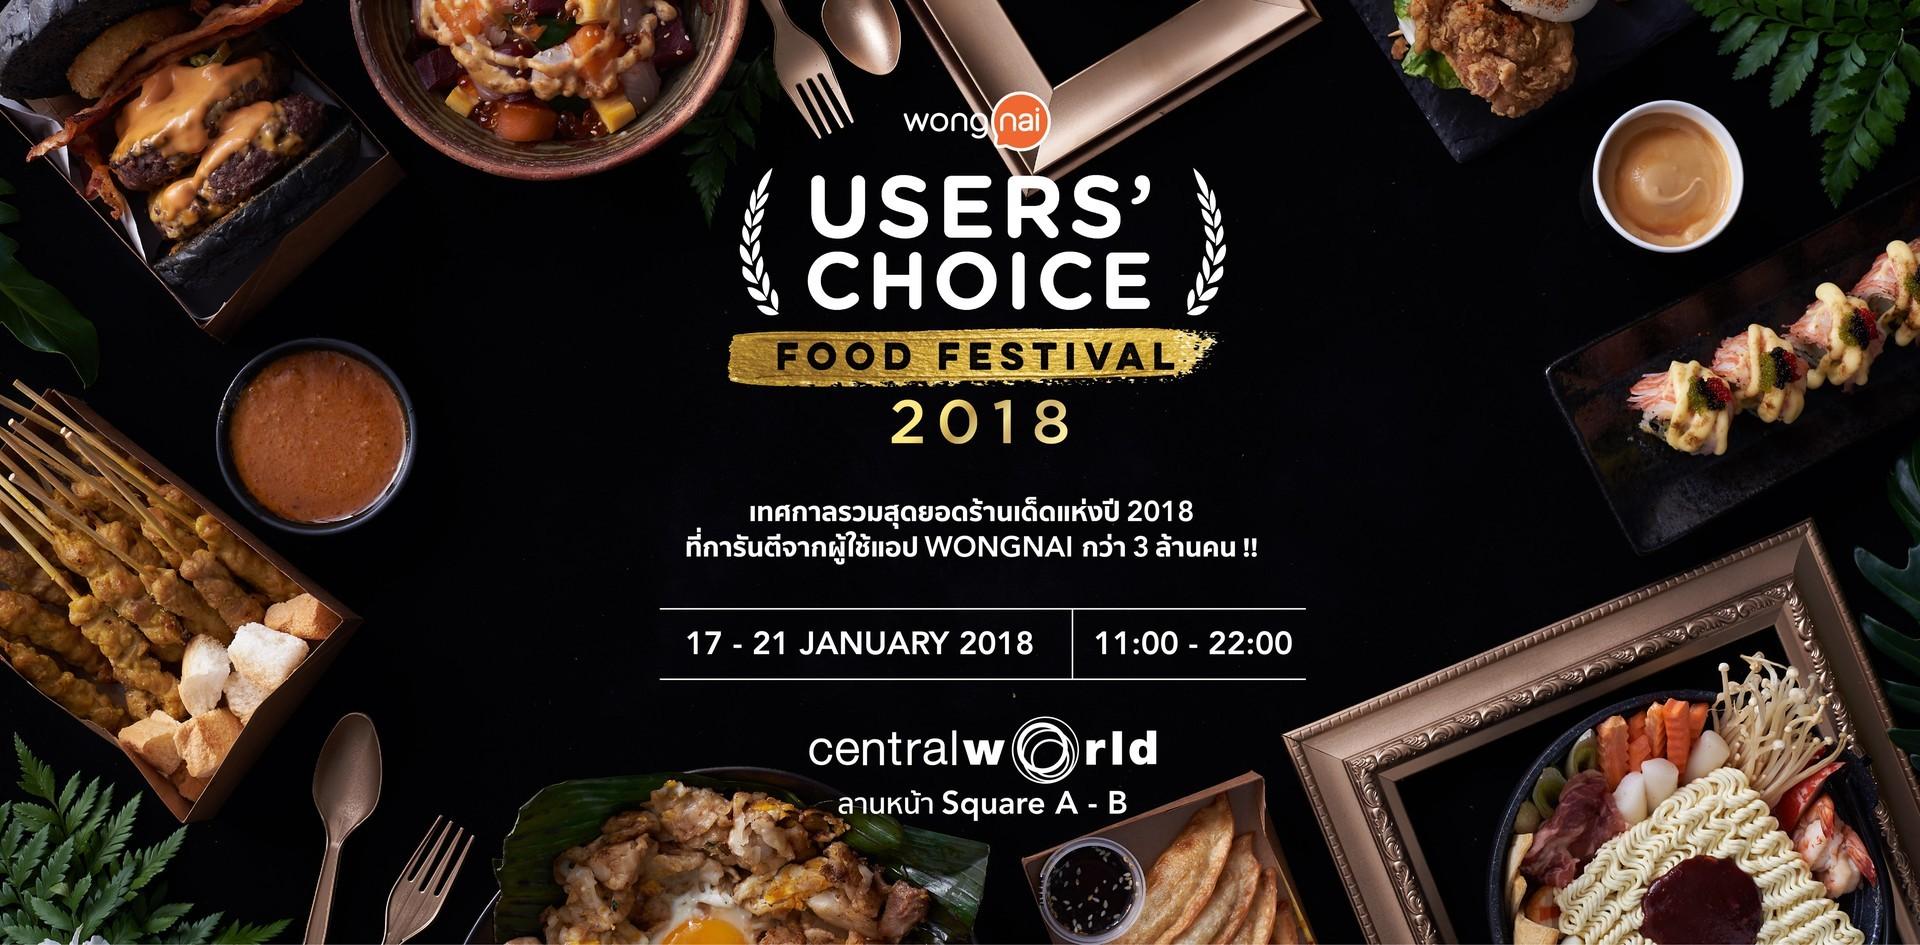 Wongnai Users' Choice Food Festival 2018